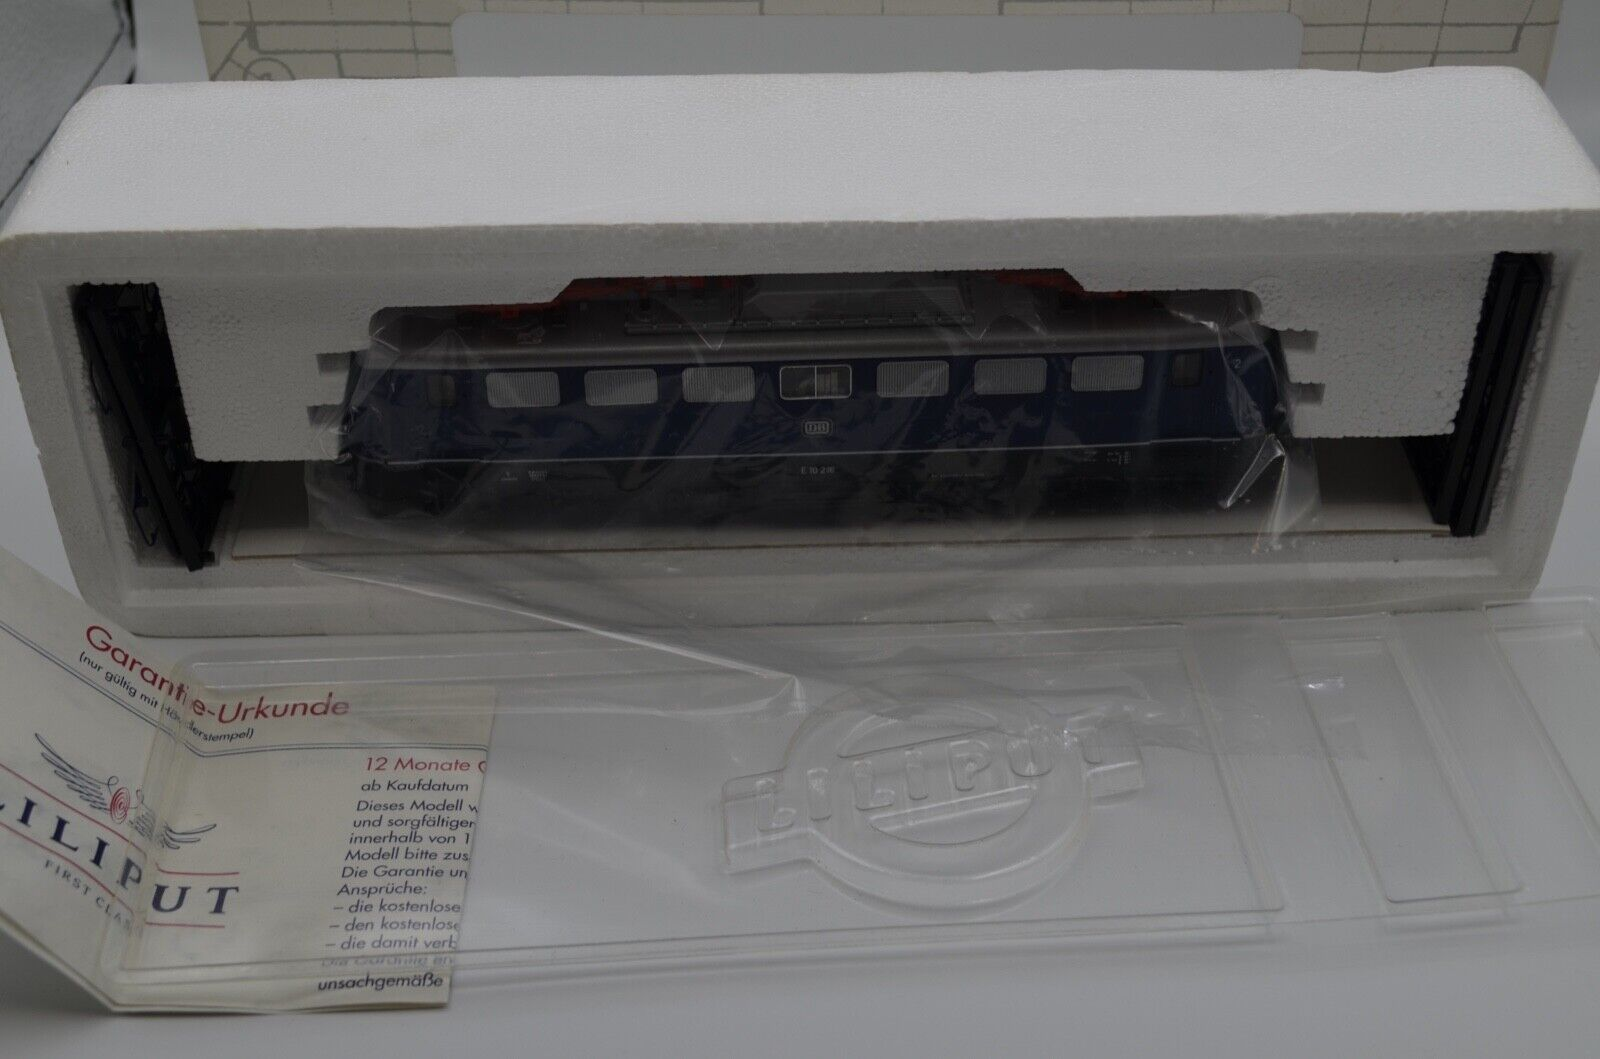 Liliput e-Lok e 10 216 DB 320610 h0 + embalaje original probablemente sin usar